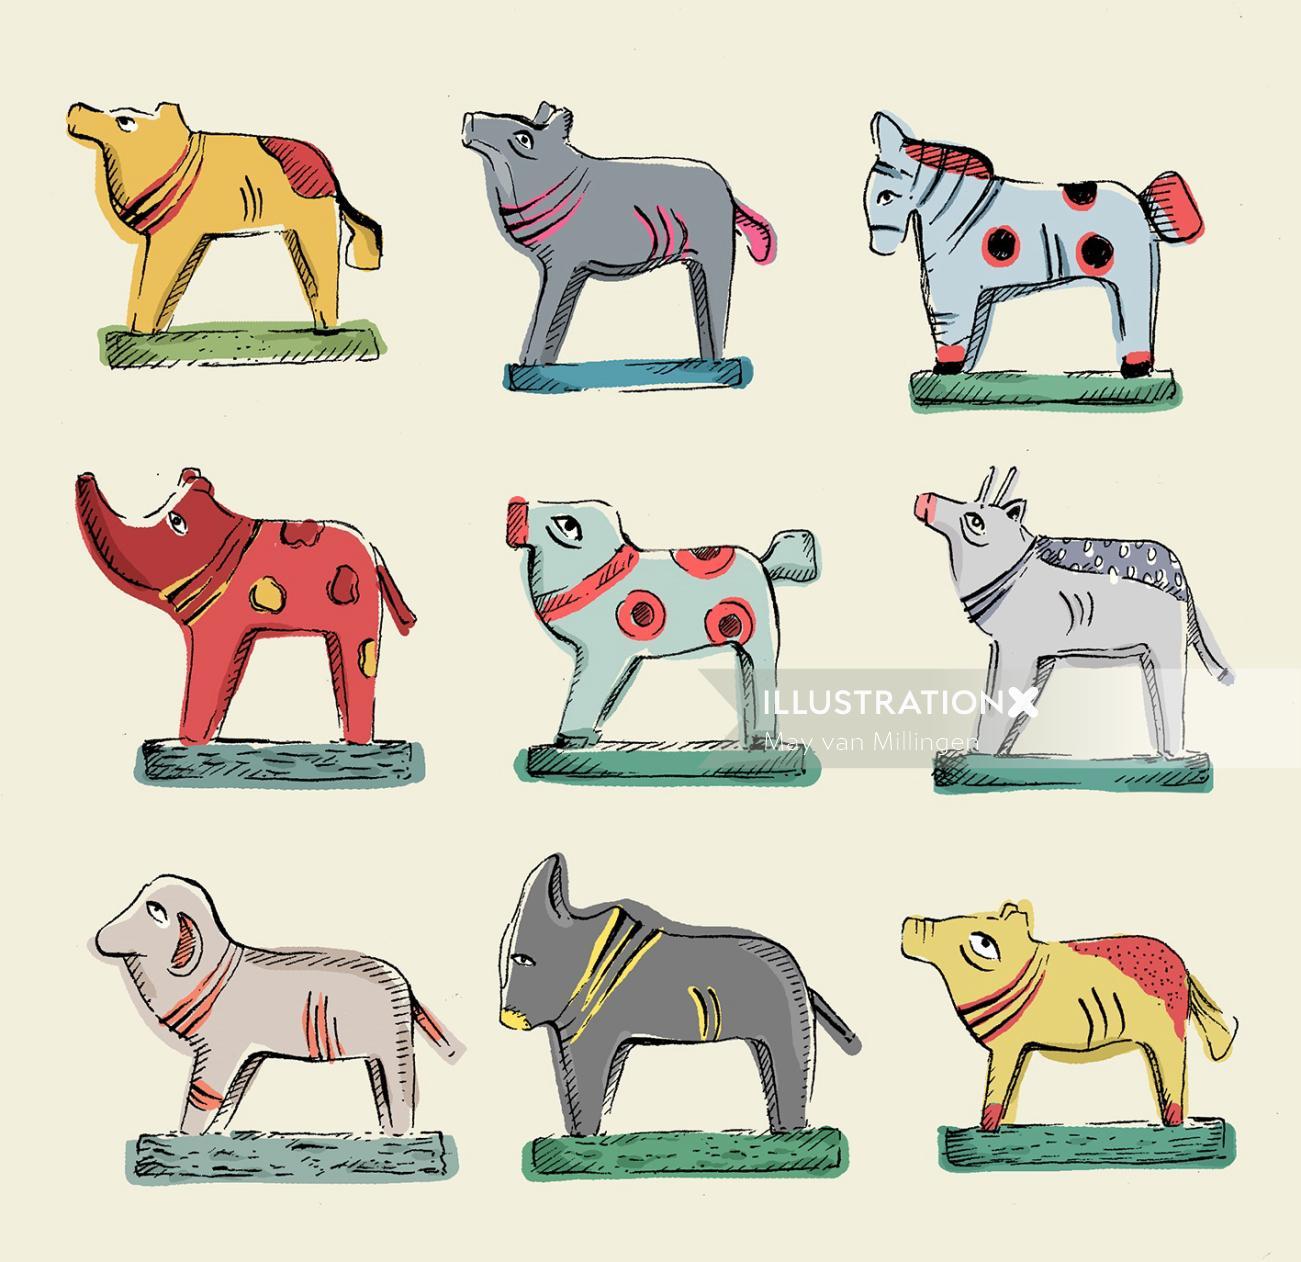 Illustration of wooden made animals